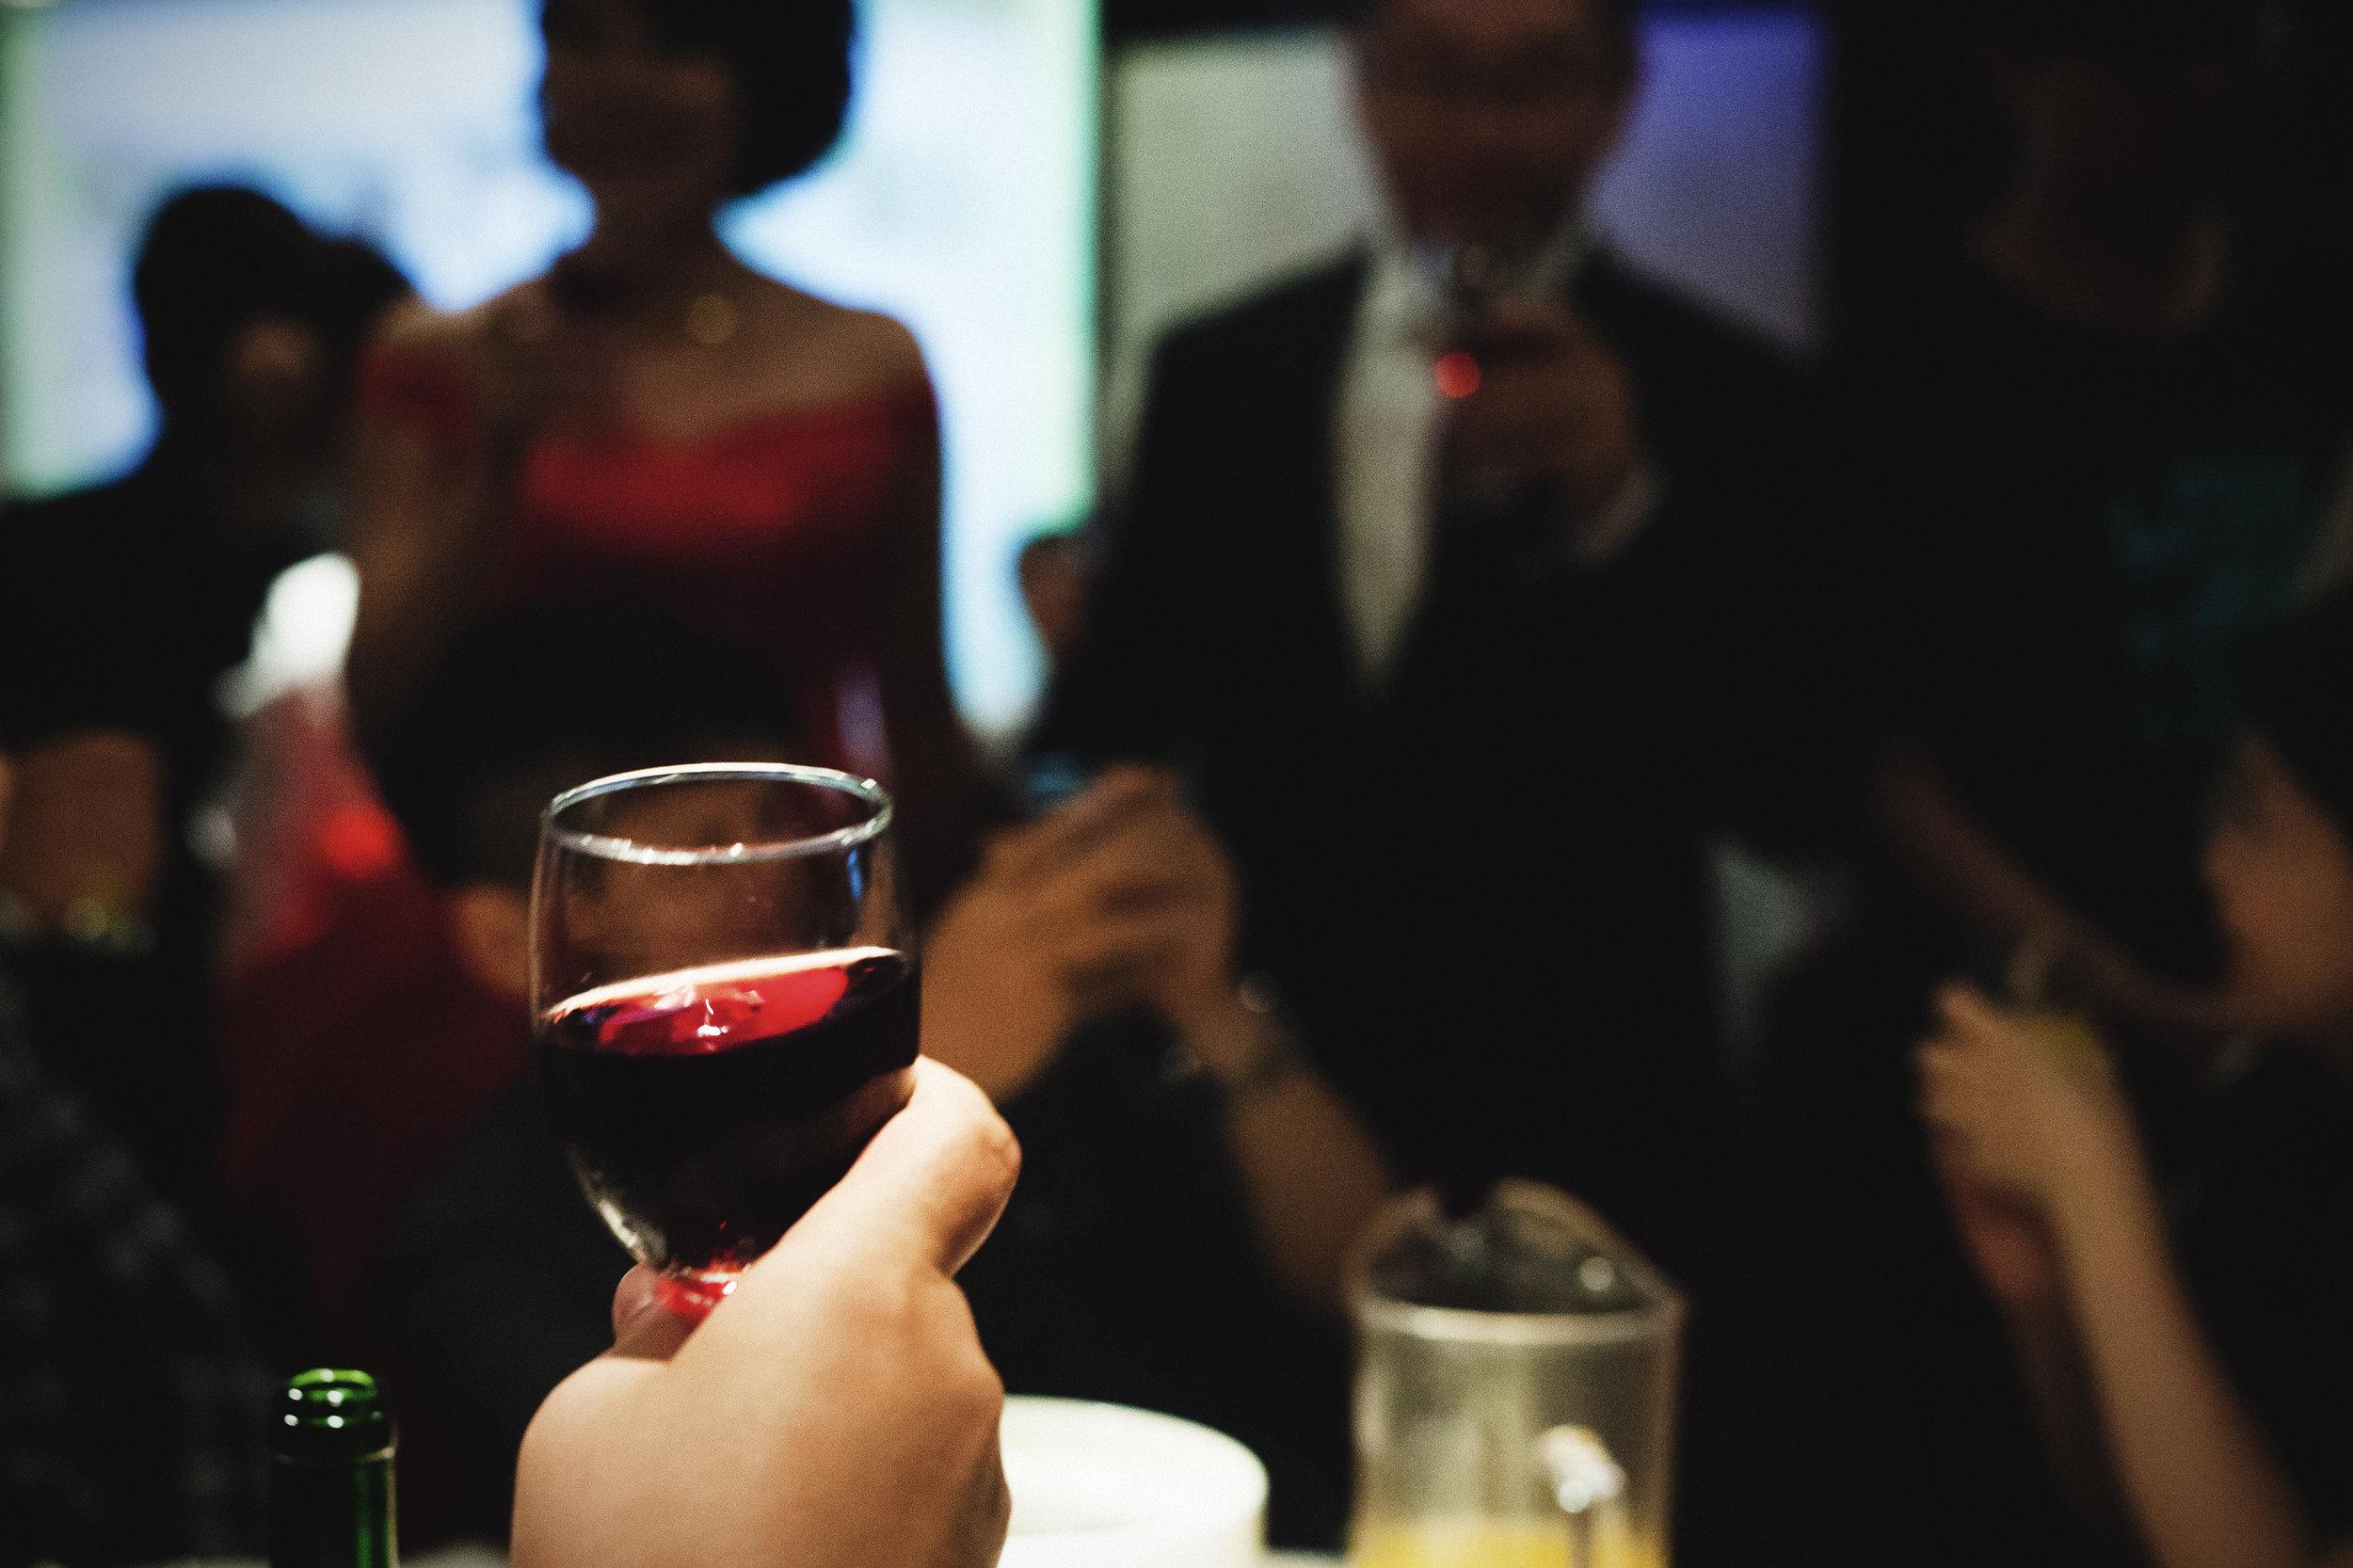 [JC]CREATIVE 女性攝影師 北投儷宴會館 補請台灣WEDDING    自然風格 台北婚攝推 女婚攝  桃園婚攝   圖像00305.JPG